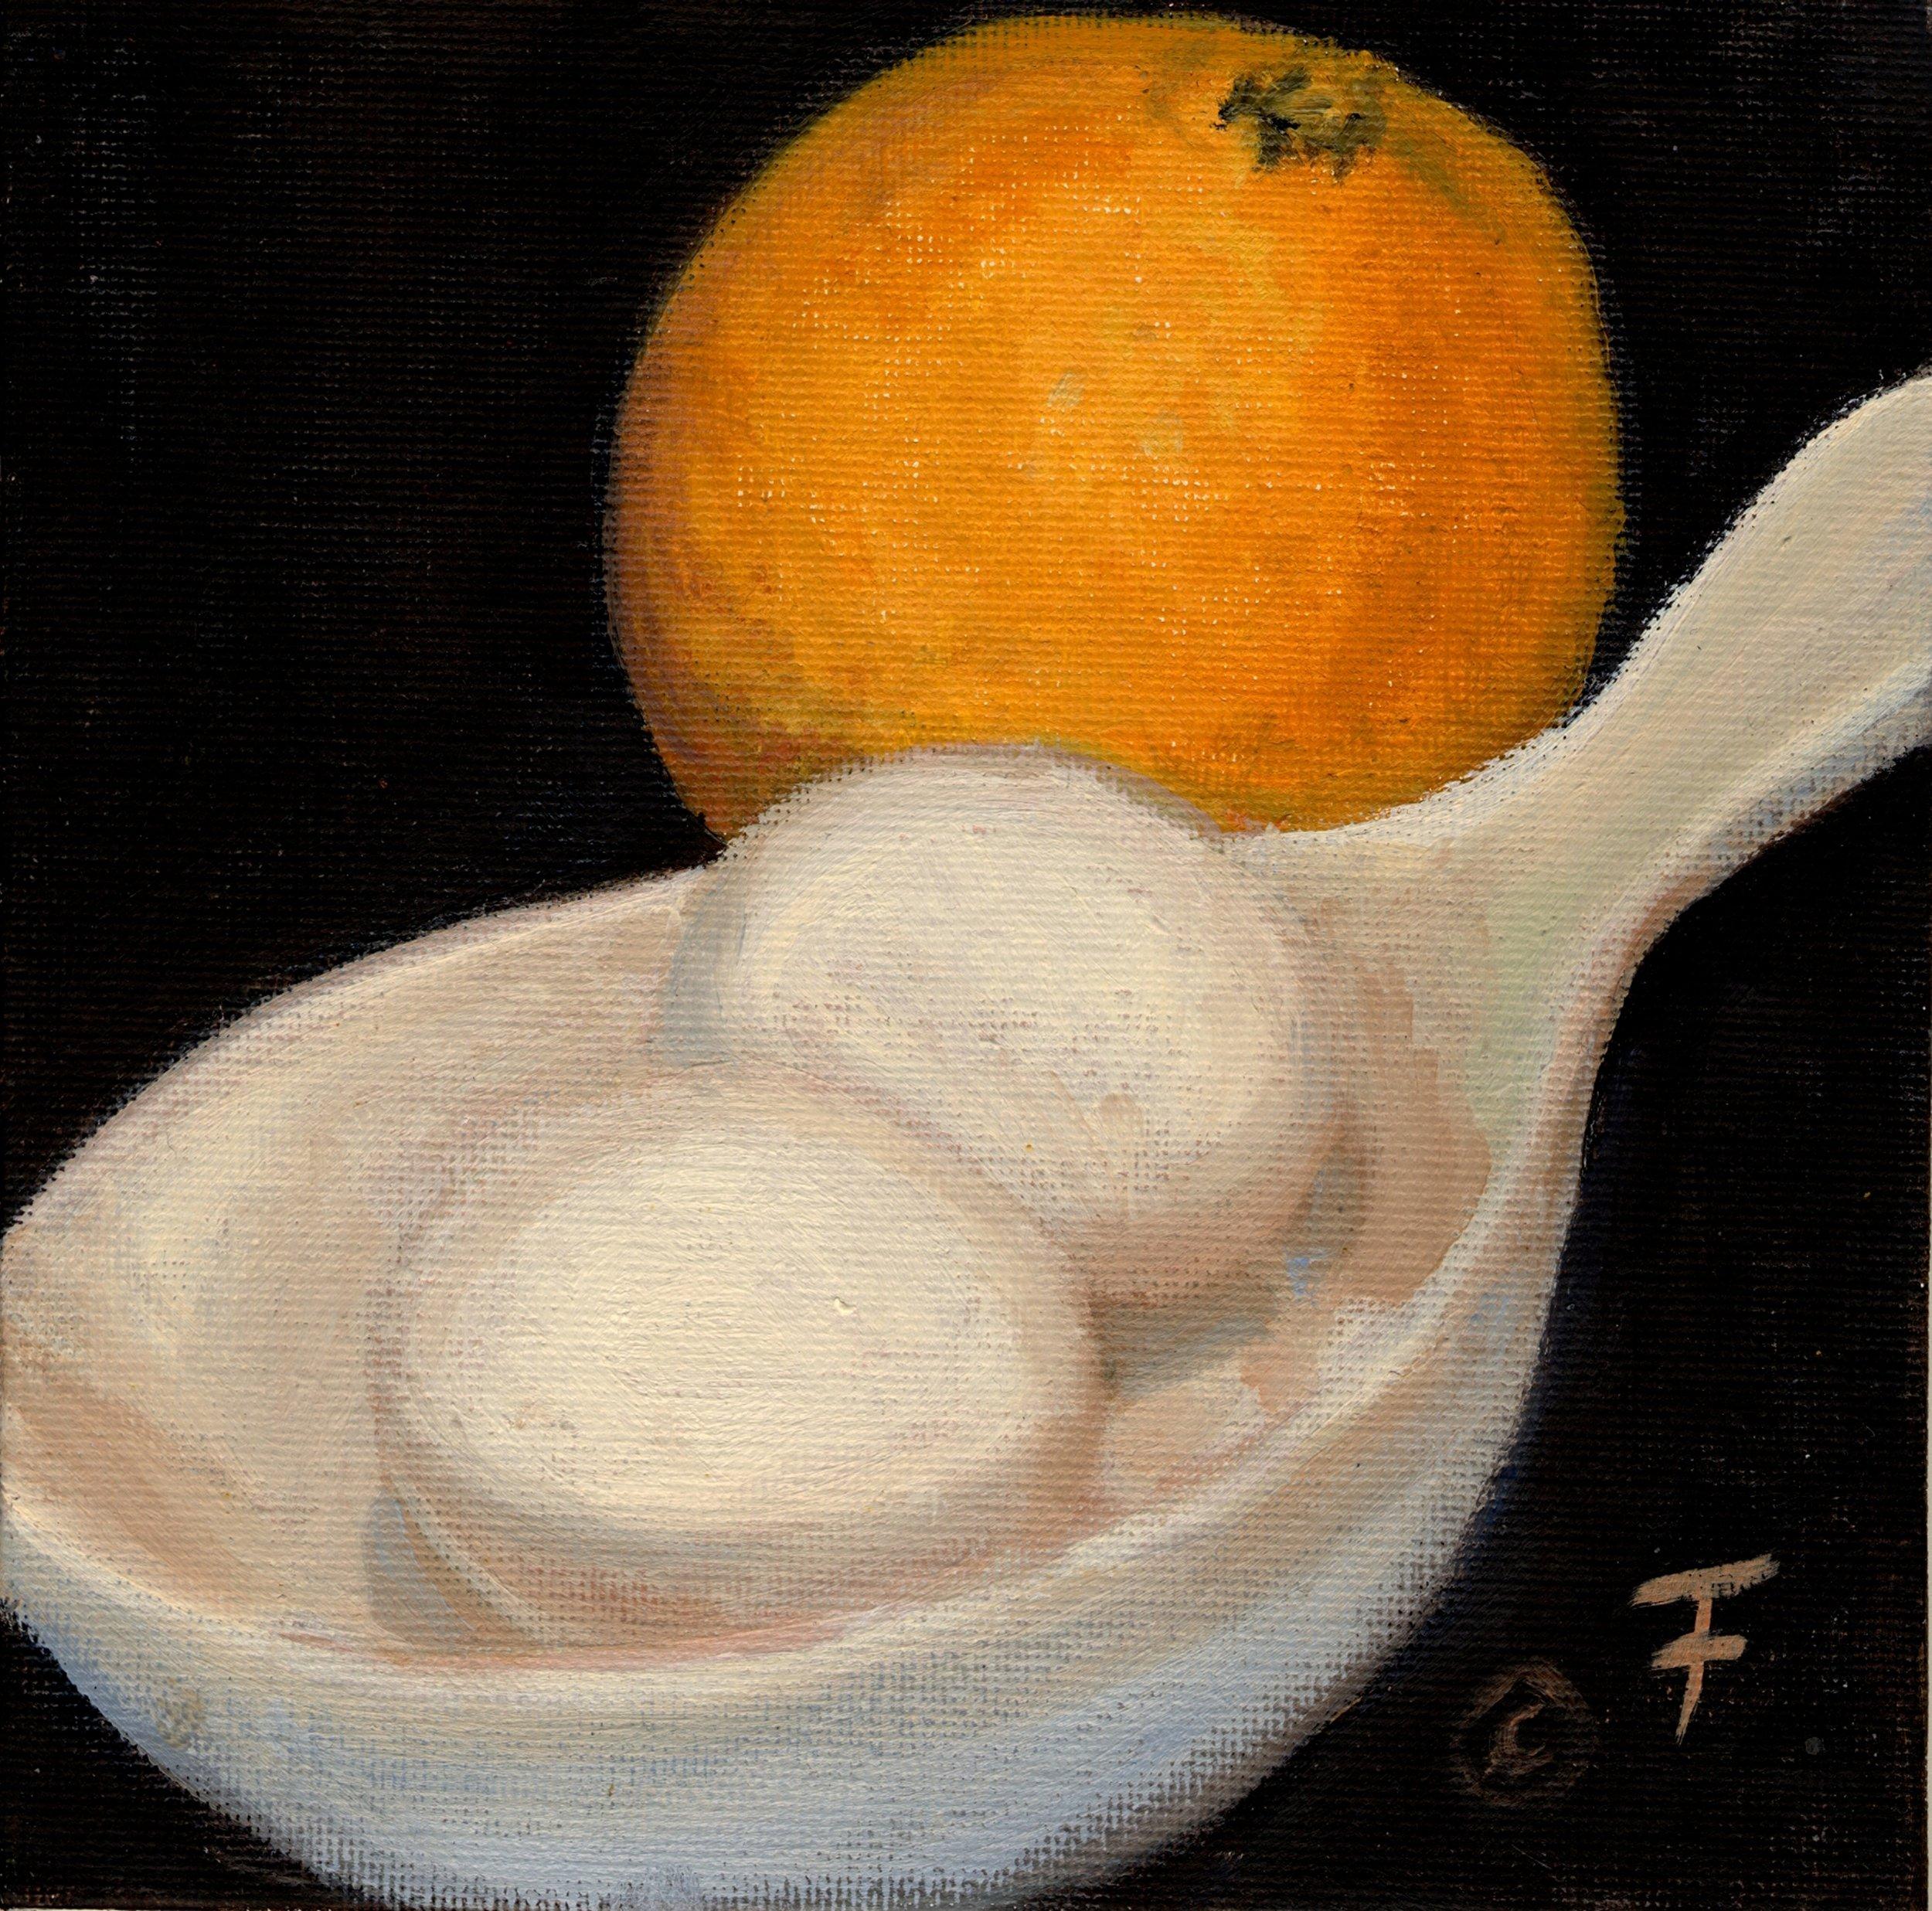 Orange and Eggs